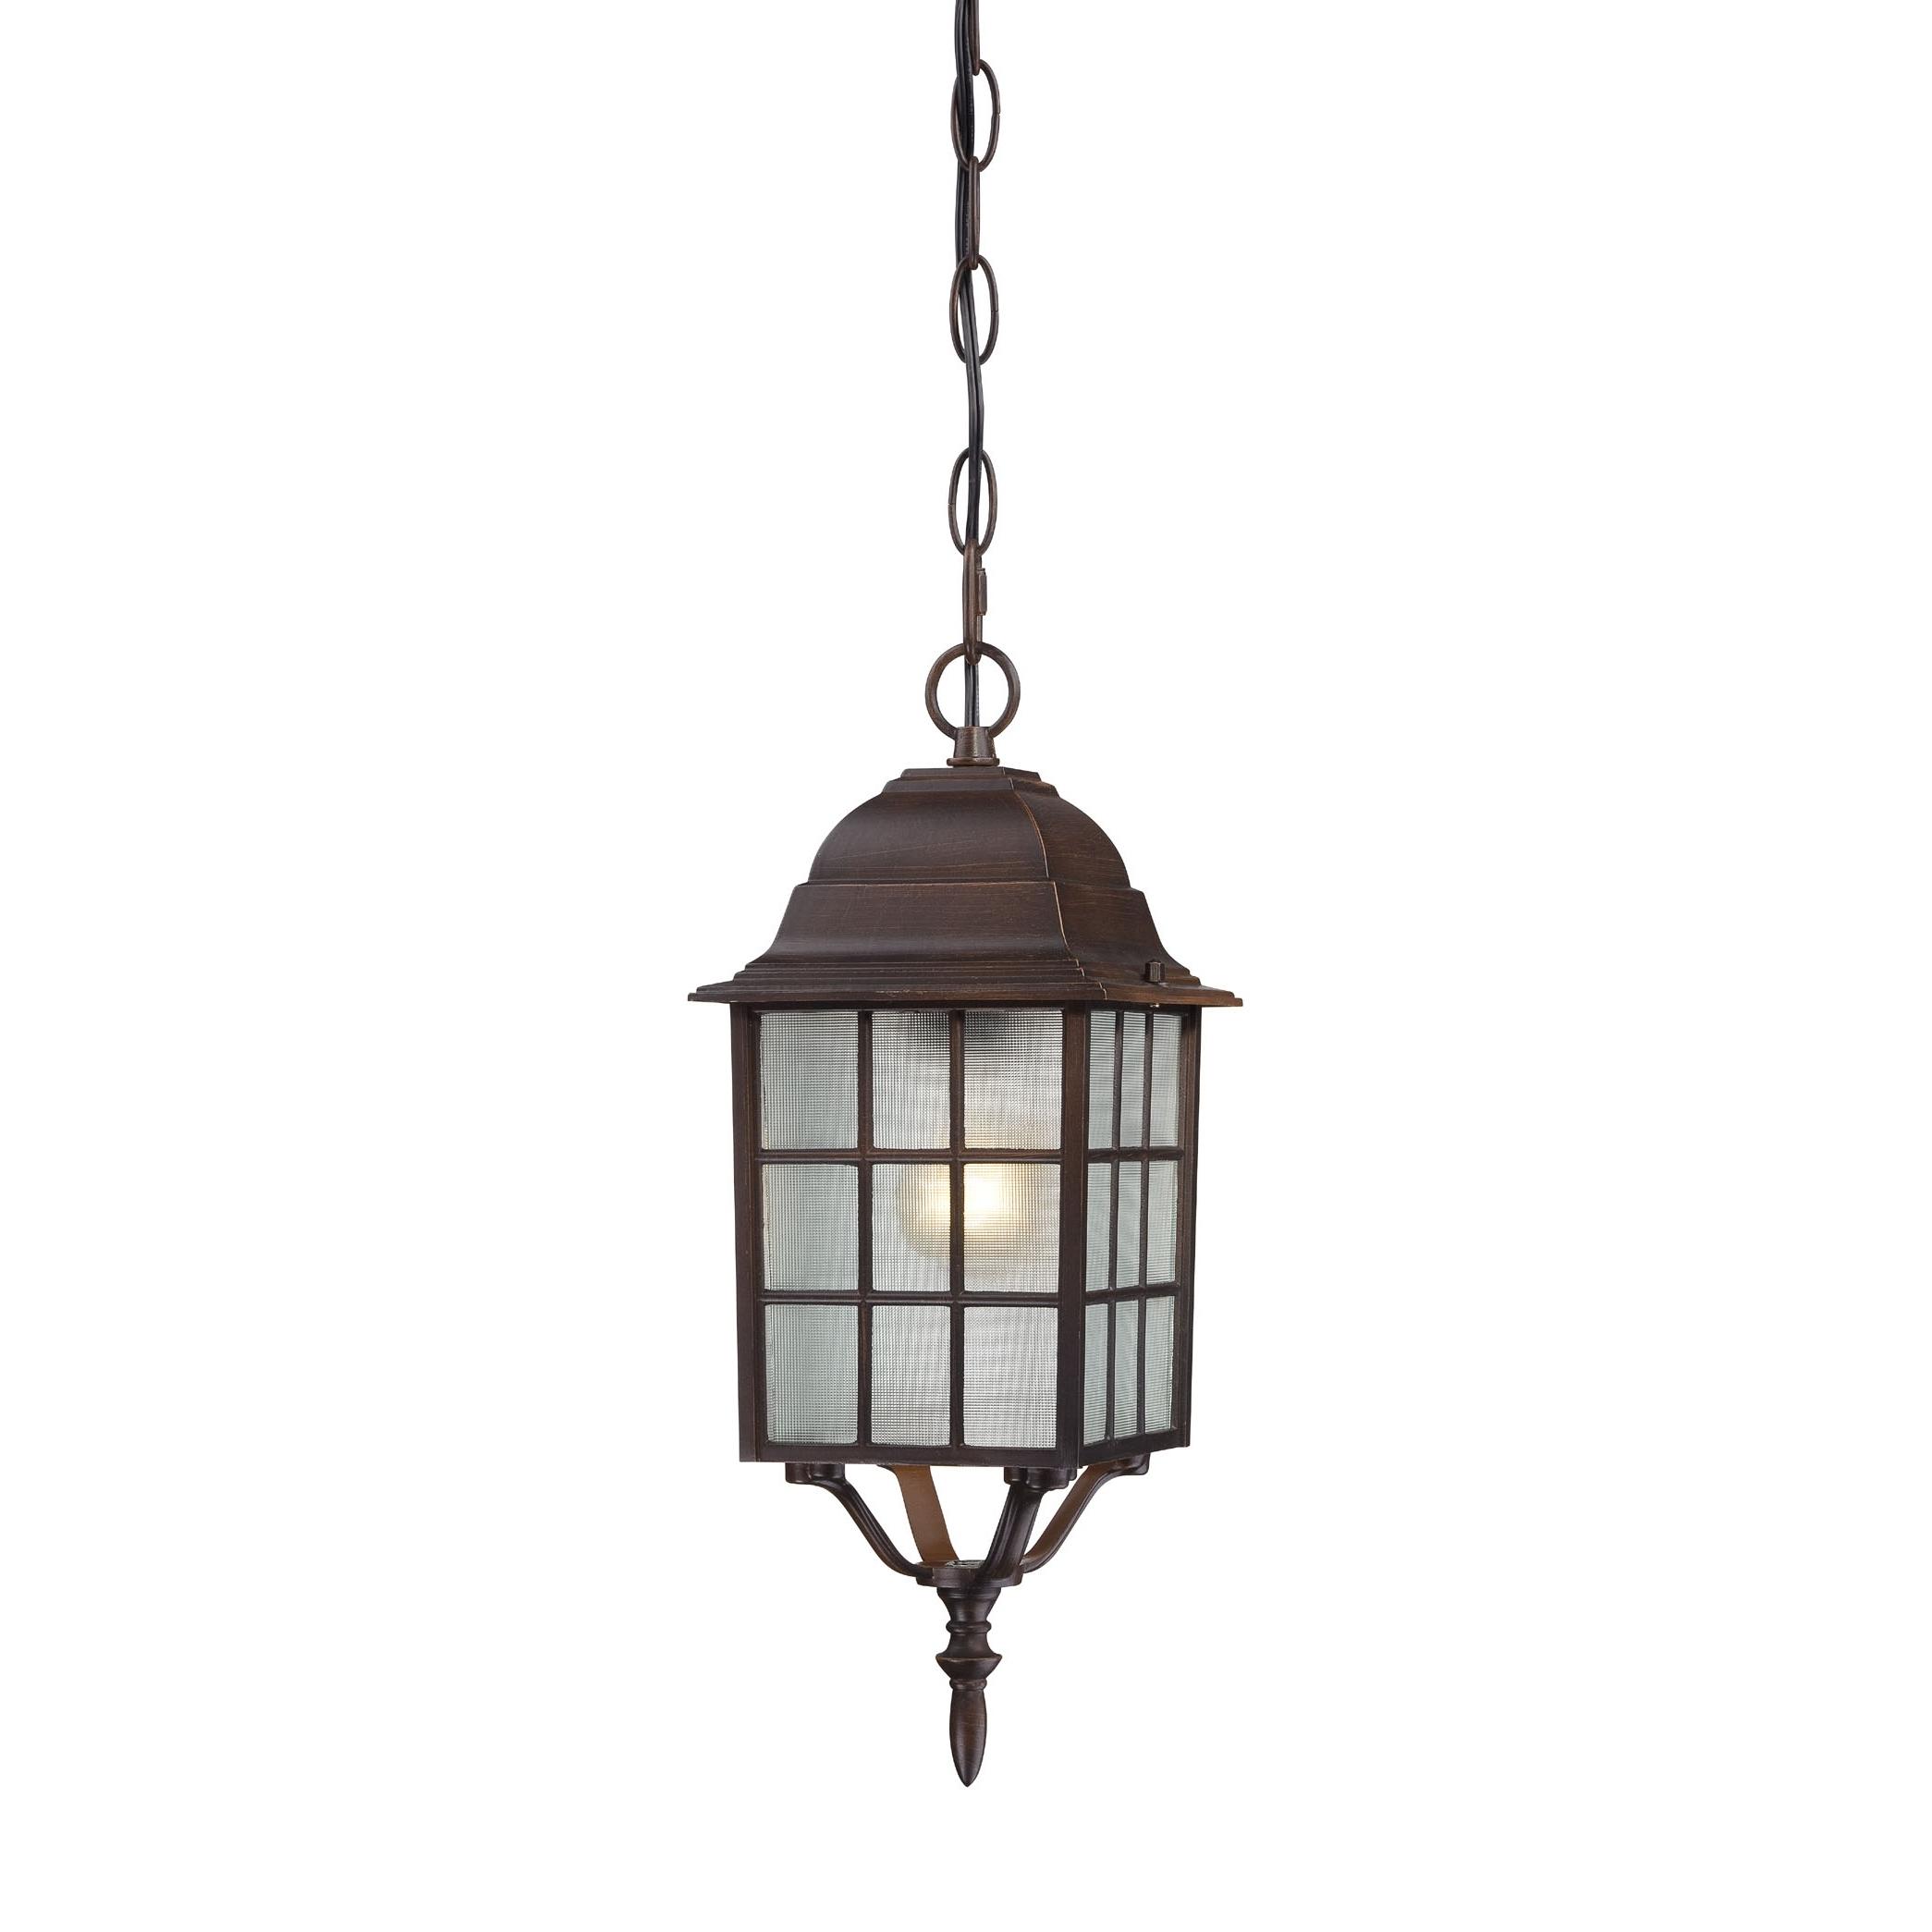 Rustic Lighting Fixtures Home Lighting Insight Regarding Small Rustic Chandeliers (Image 18 of 25)